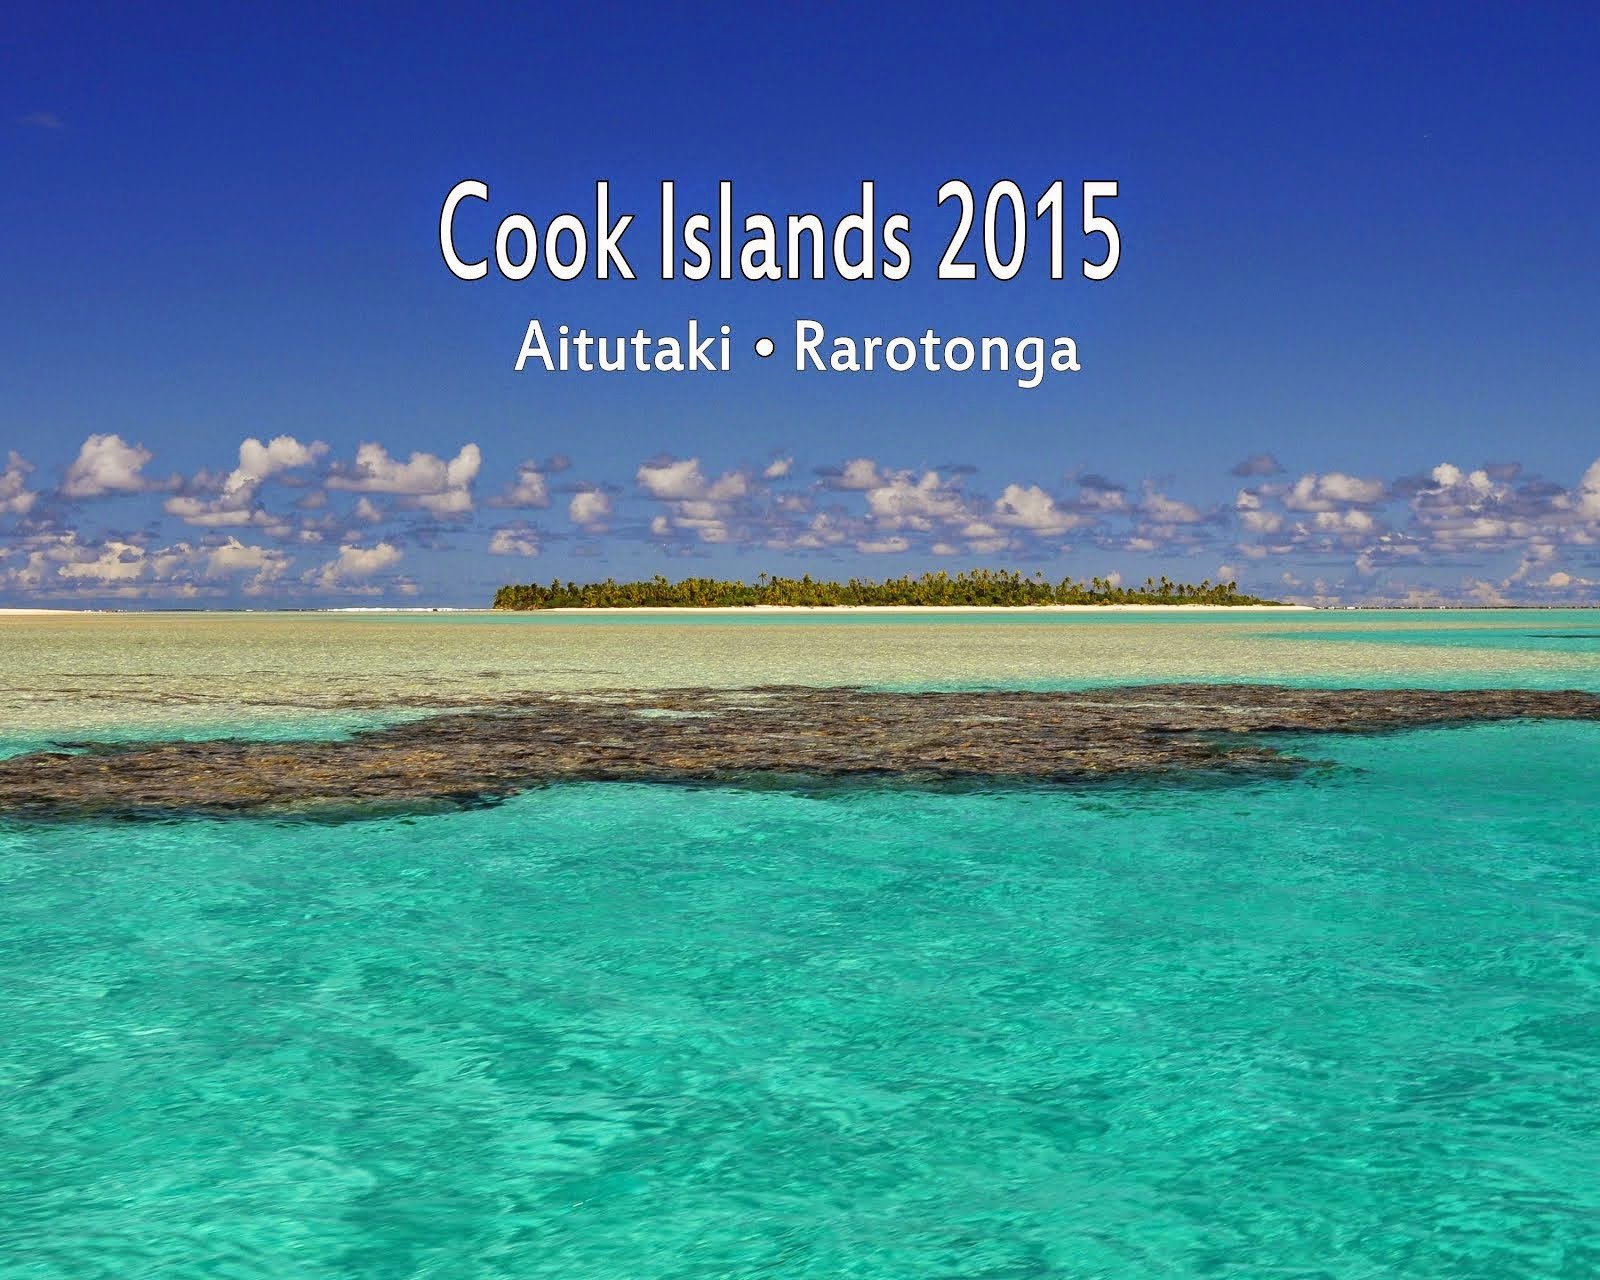 Cook Islands 2015 Calendar